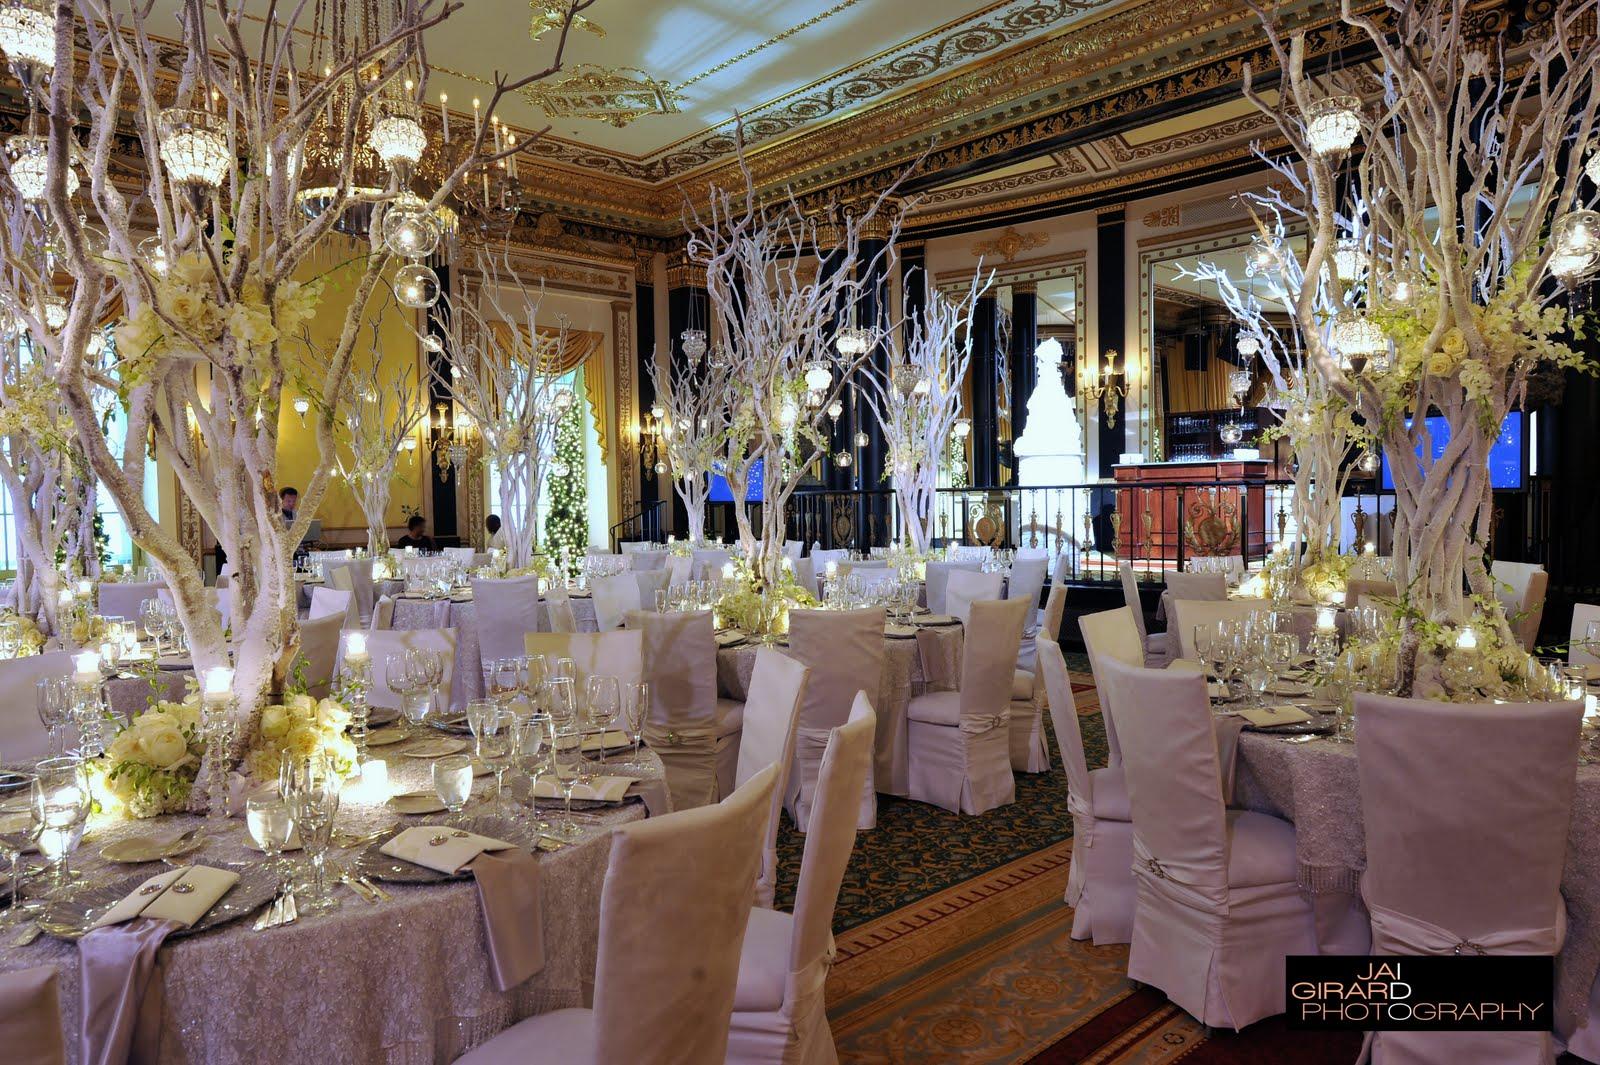 Wonderful Rustic Elegance Wedding Decor Pictures Inspirations – Dievoon